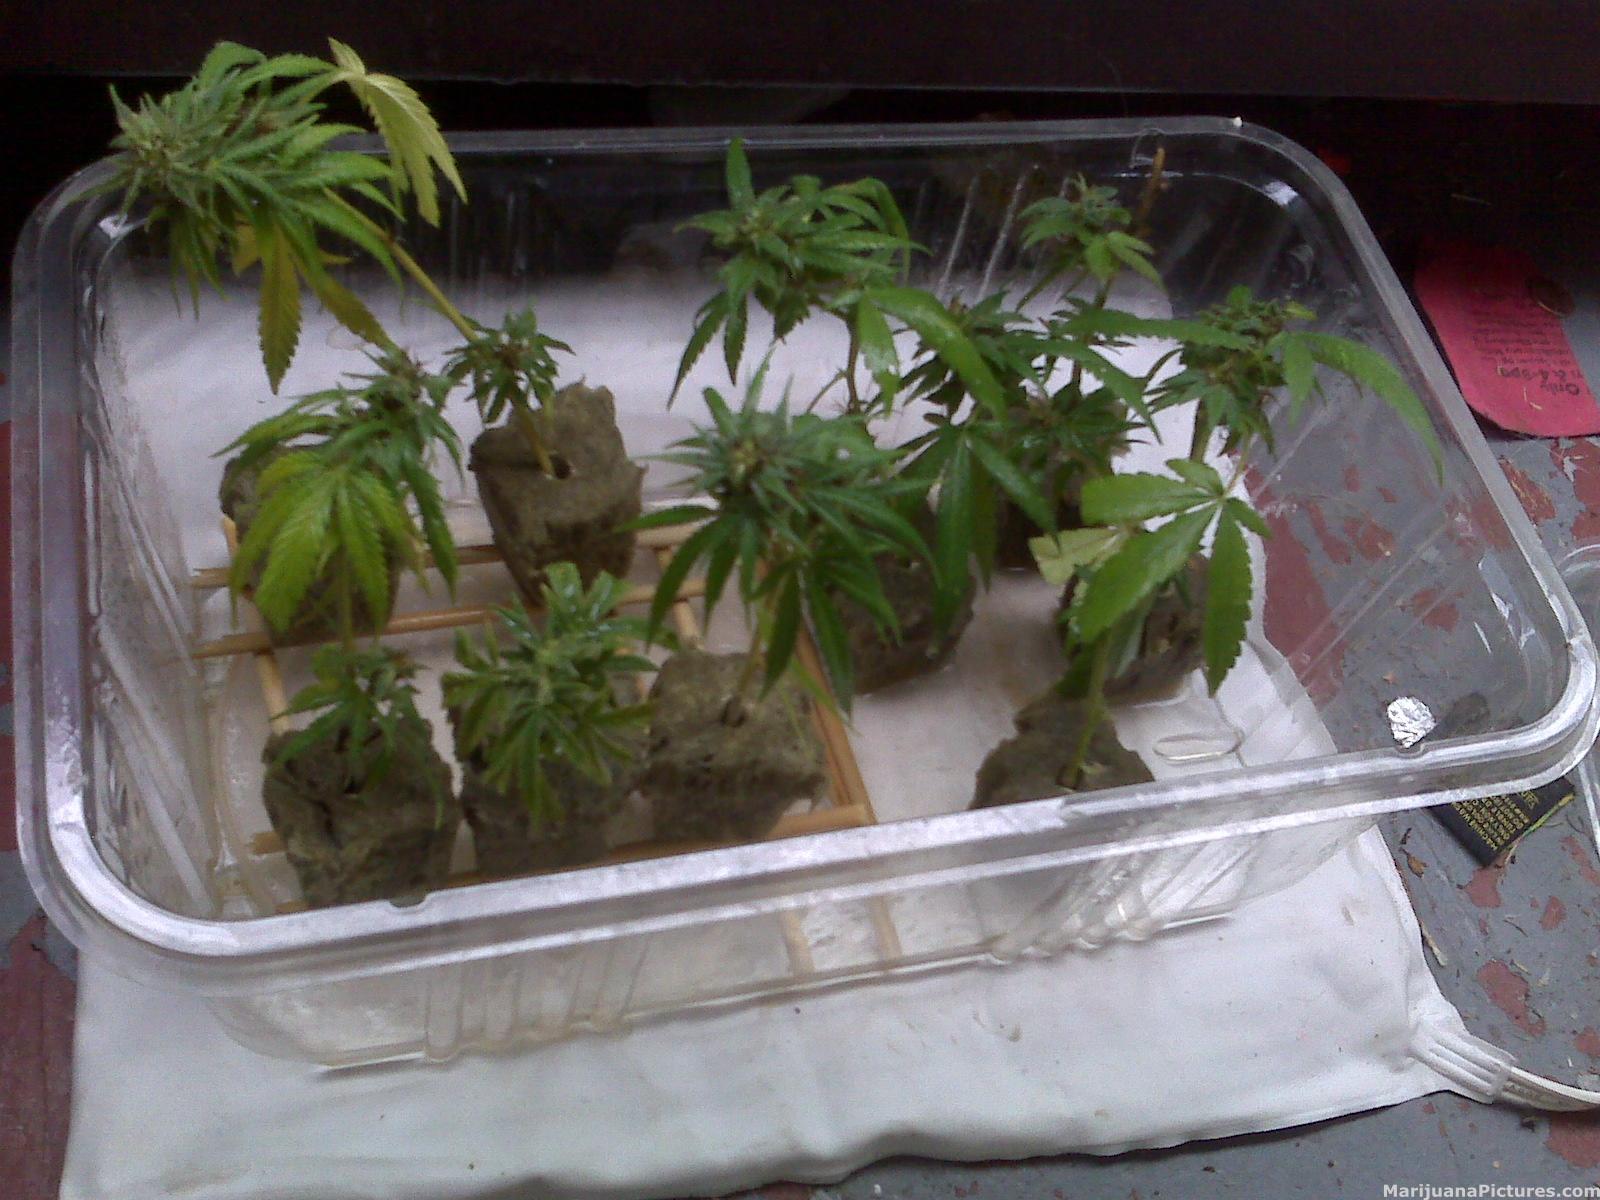 Weed clones